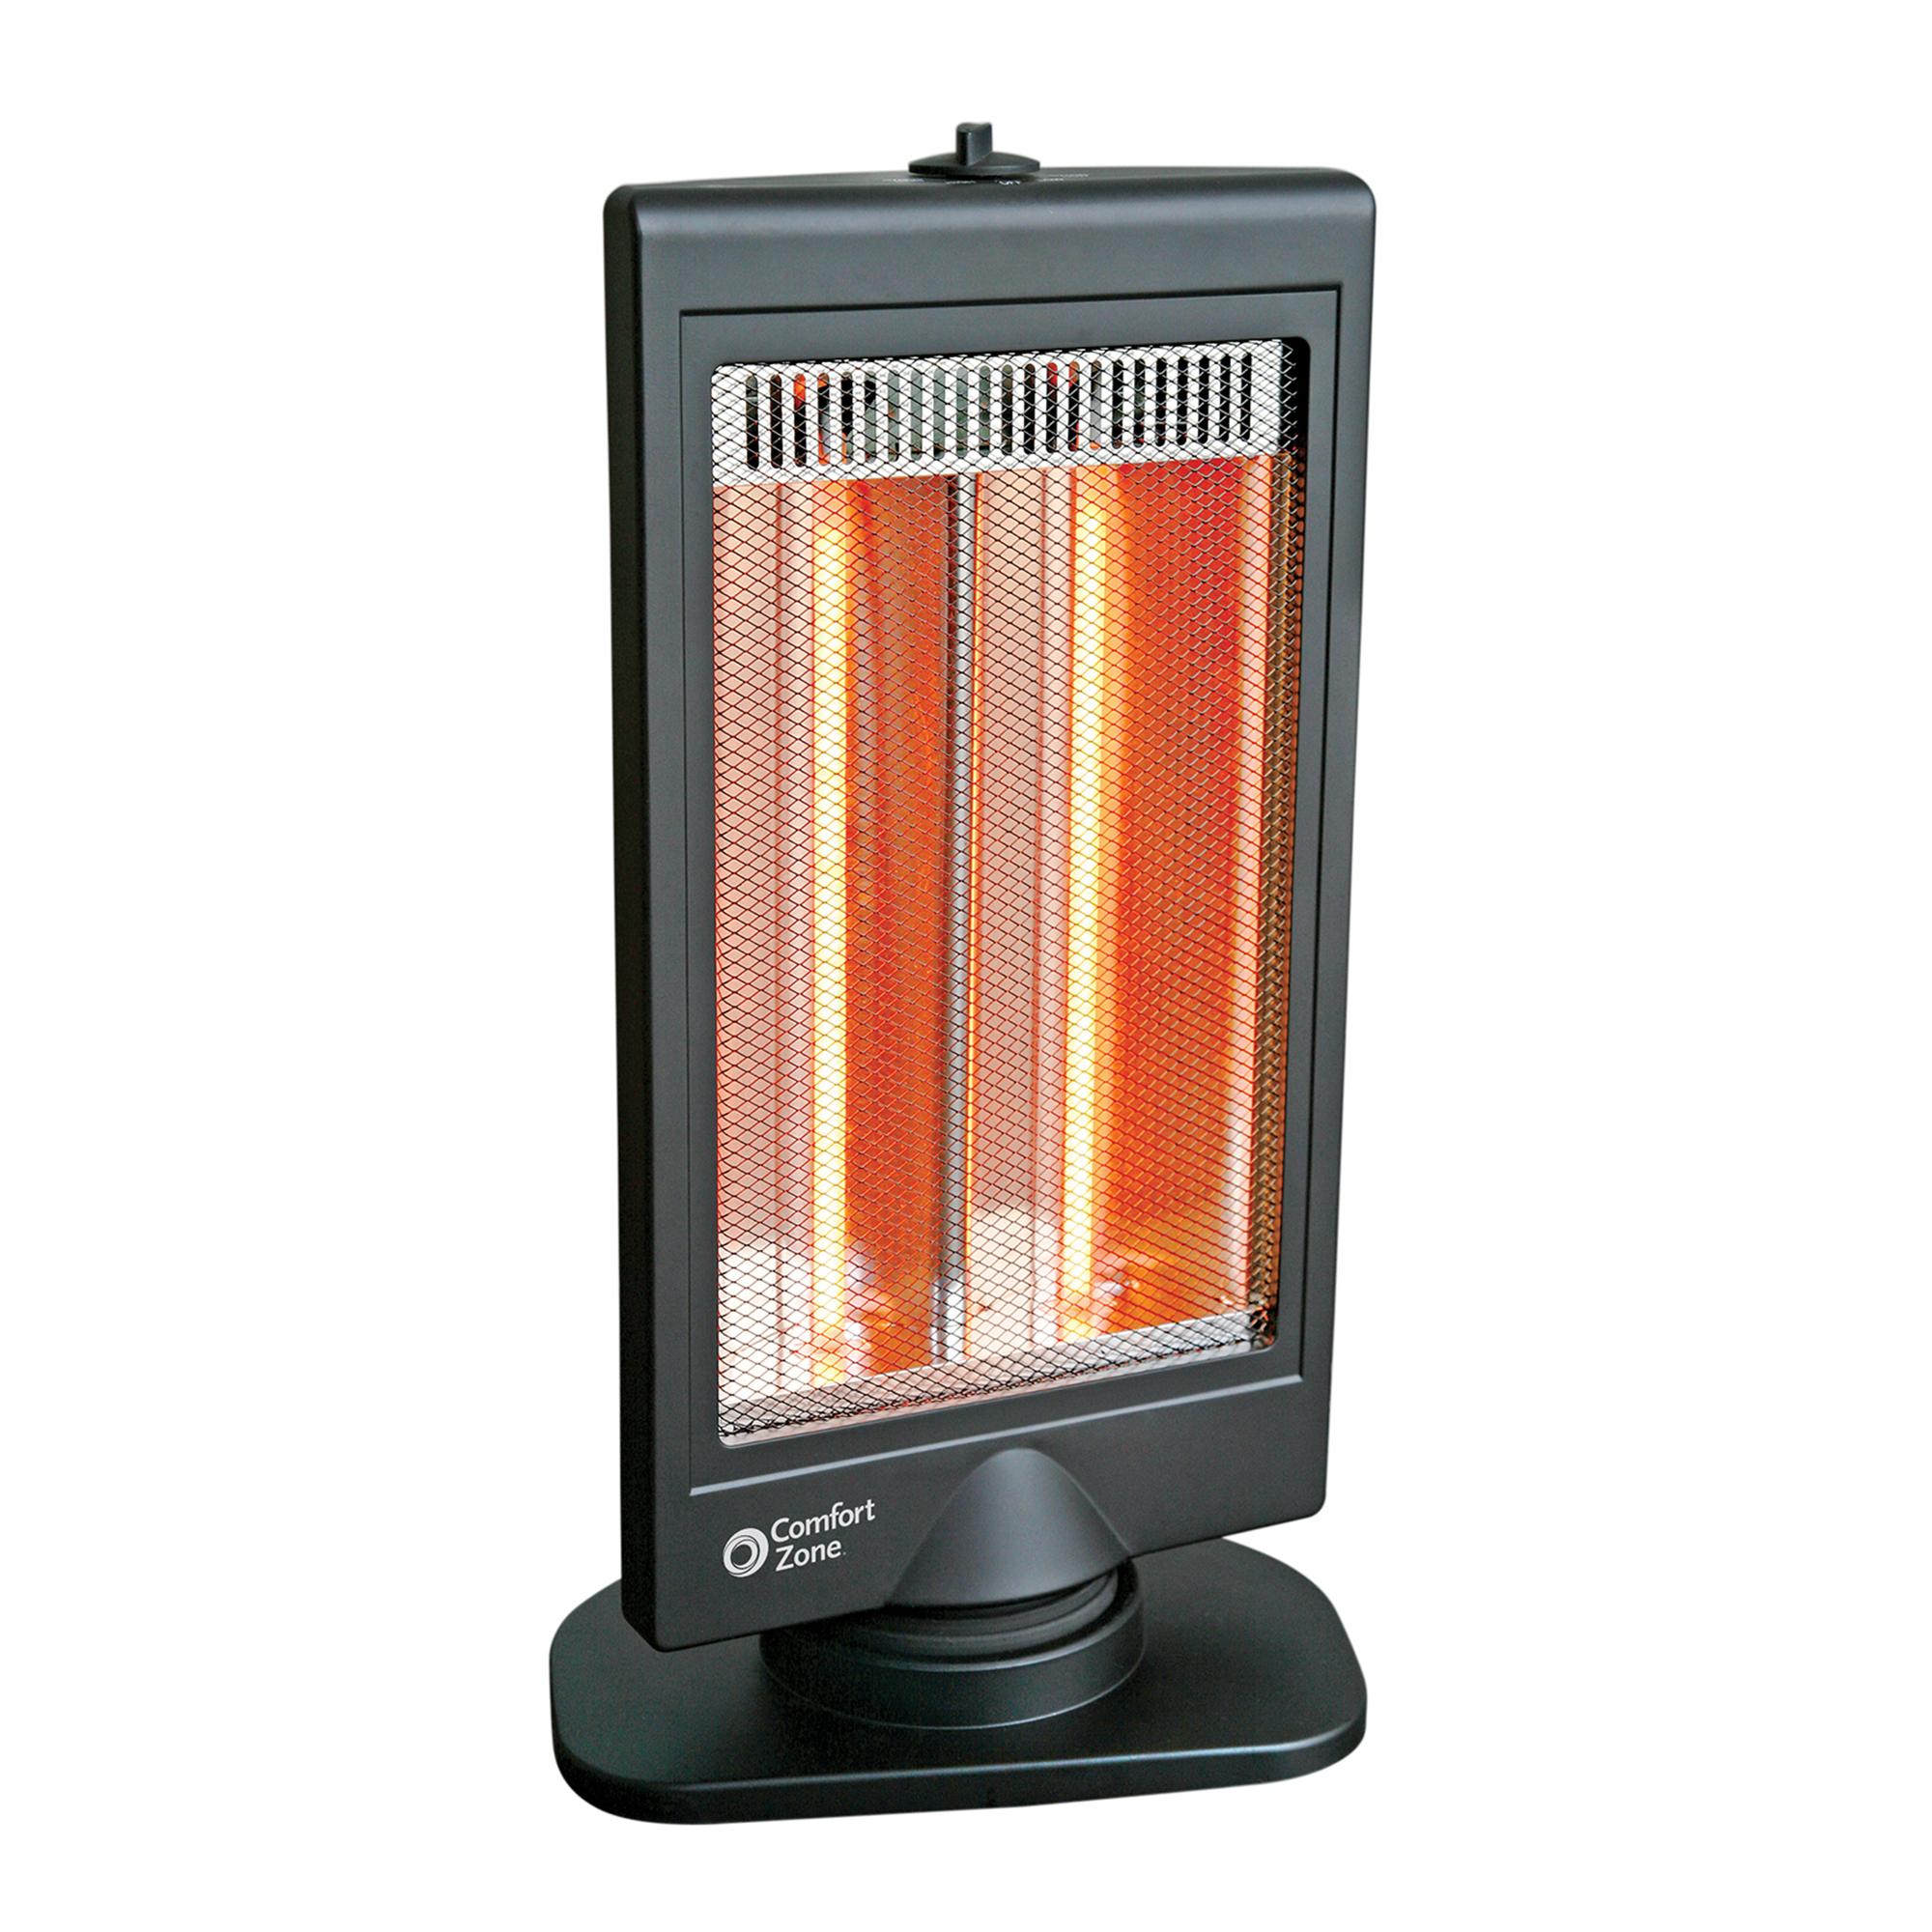 Comfort Zone Flat Panel Halogen Heater Kamcor